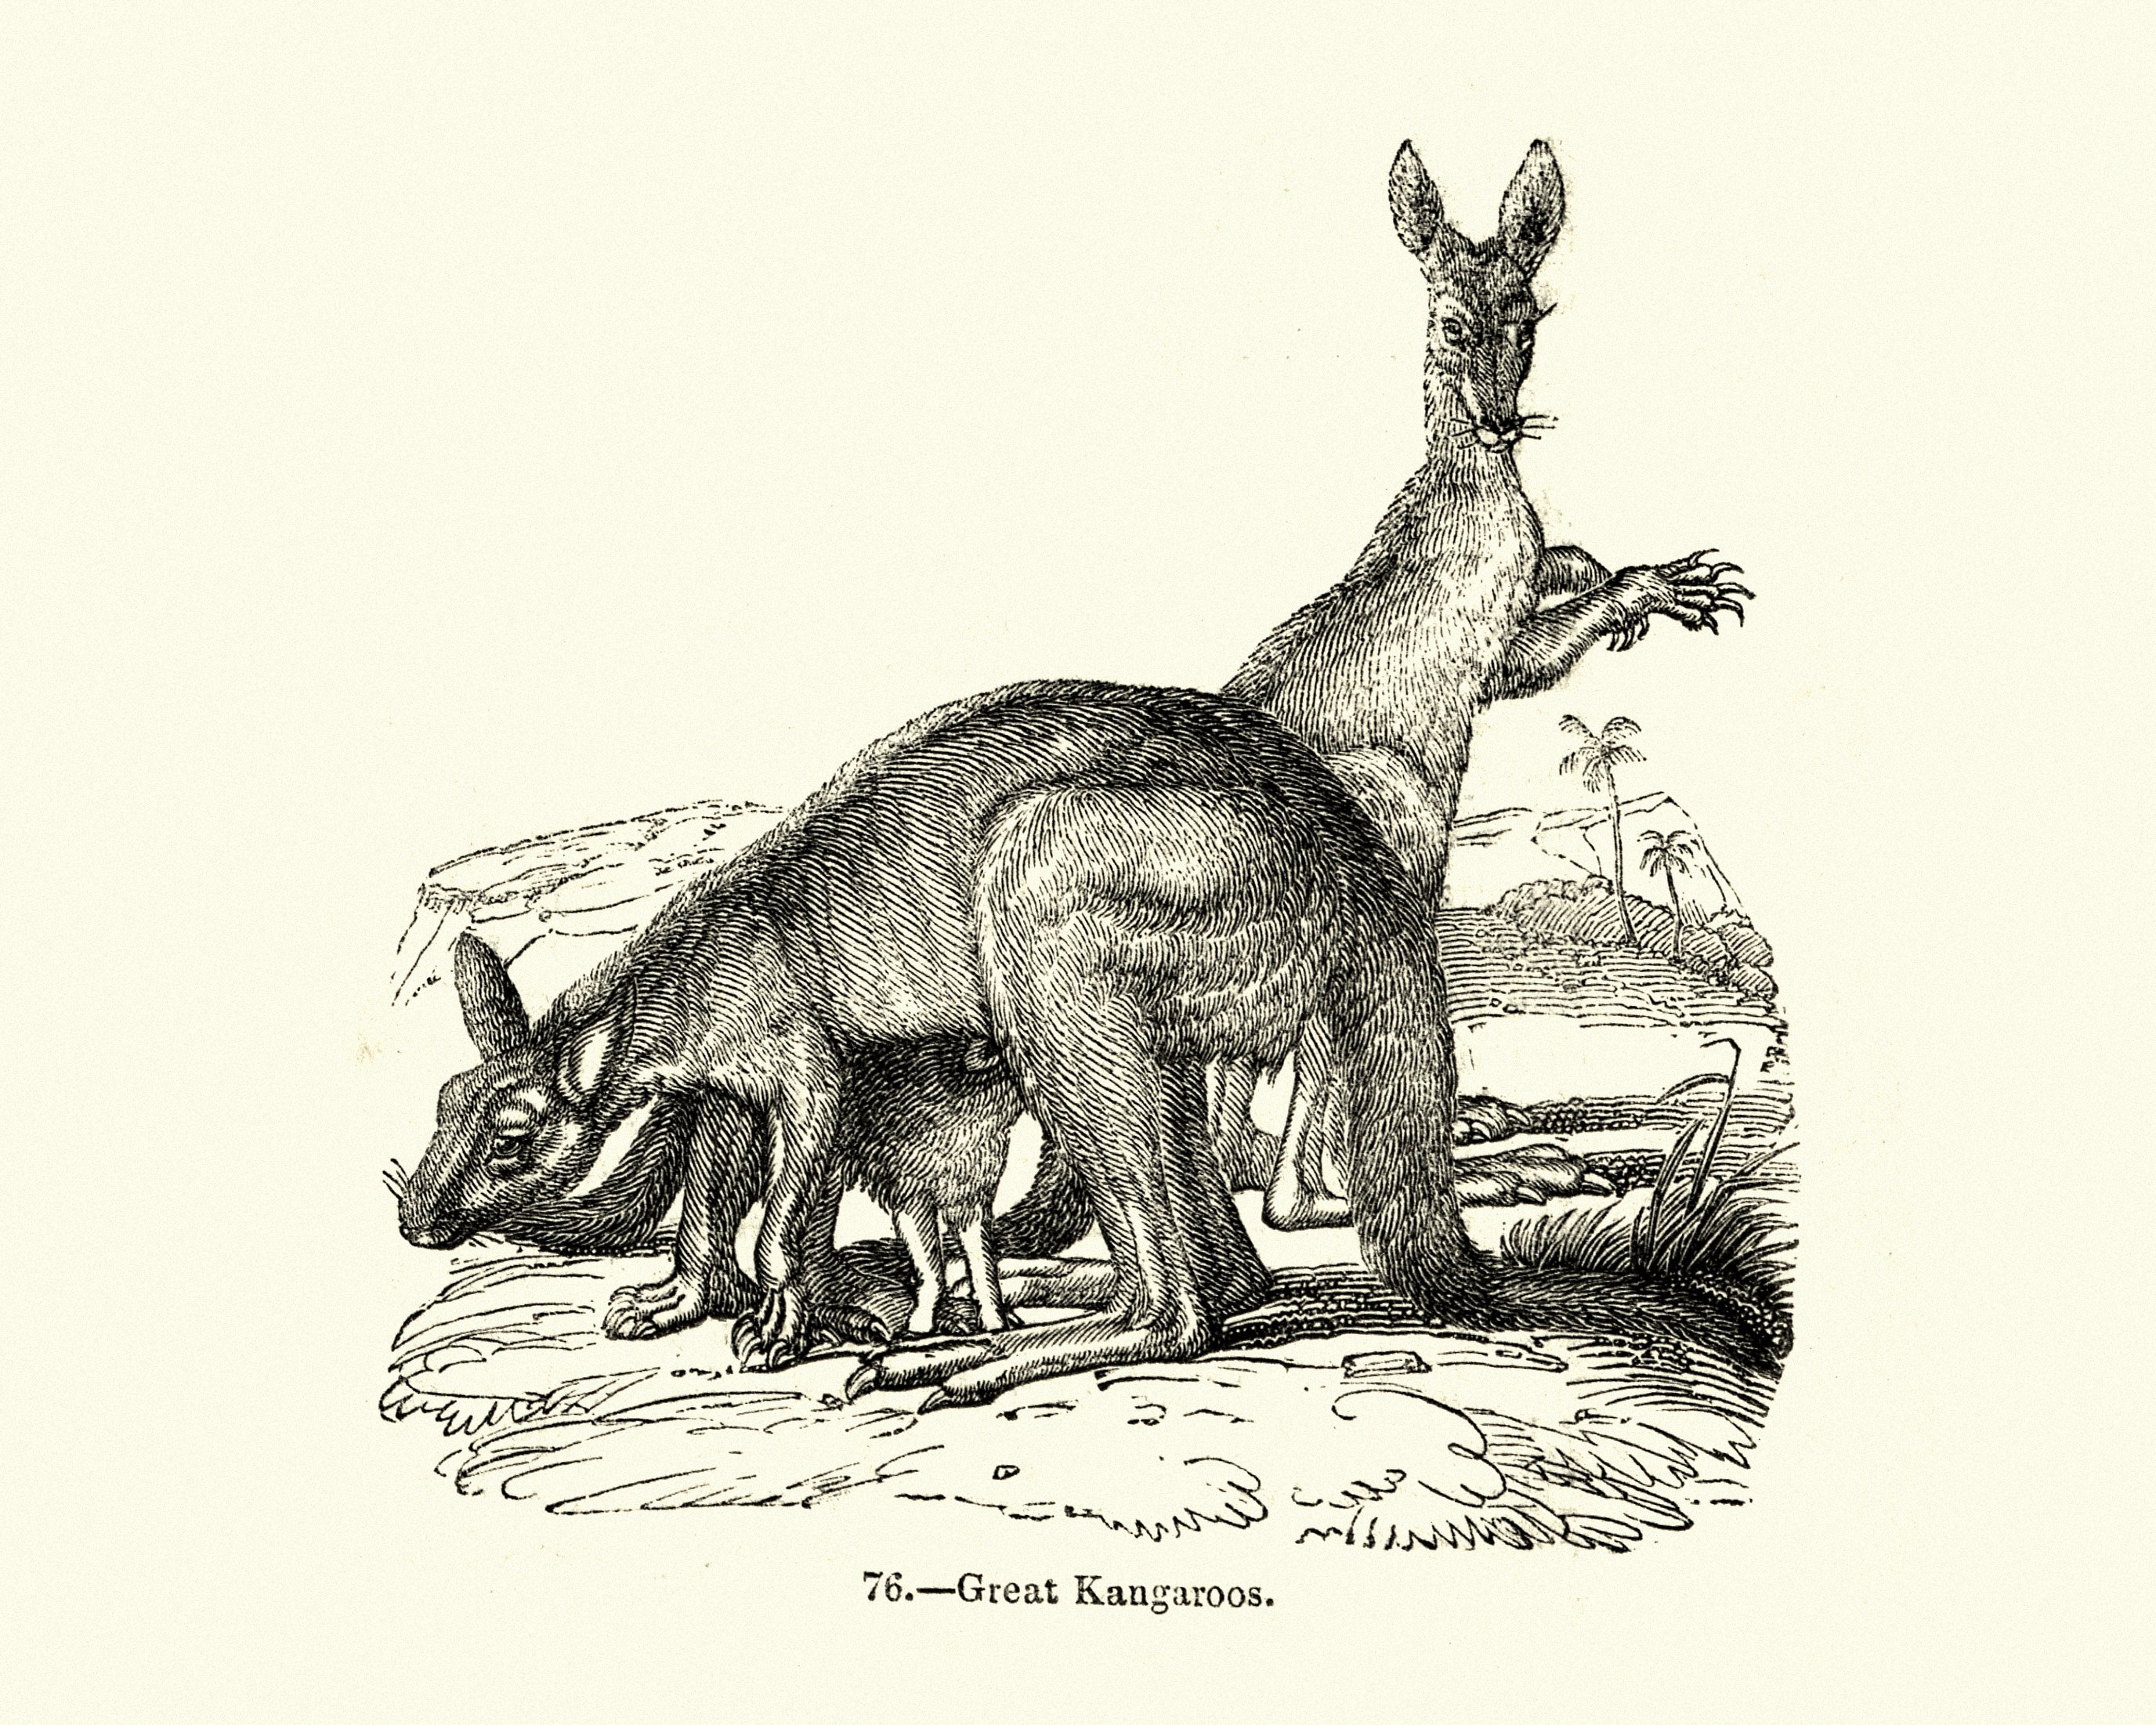 Vintage engraving of a marsupial, the great kangaroo. (iStock Photo)